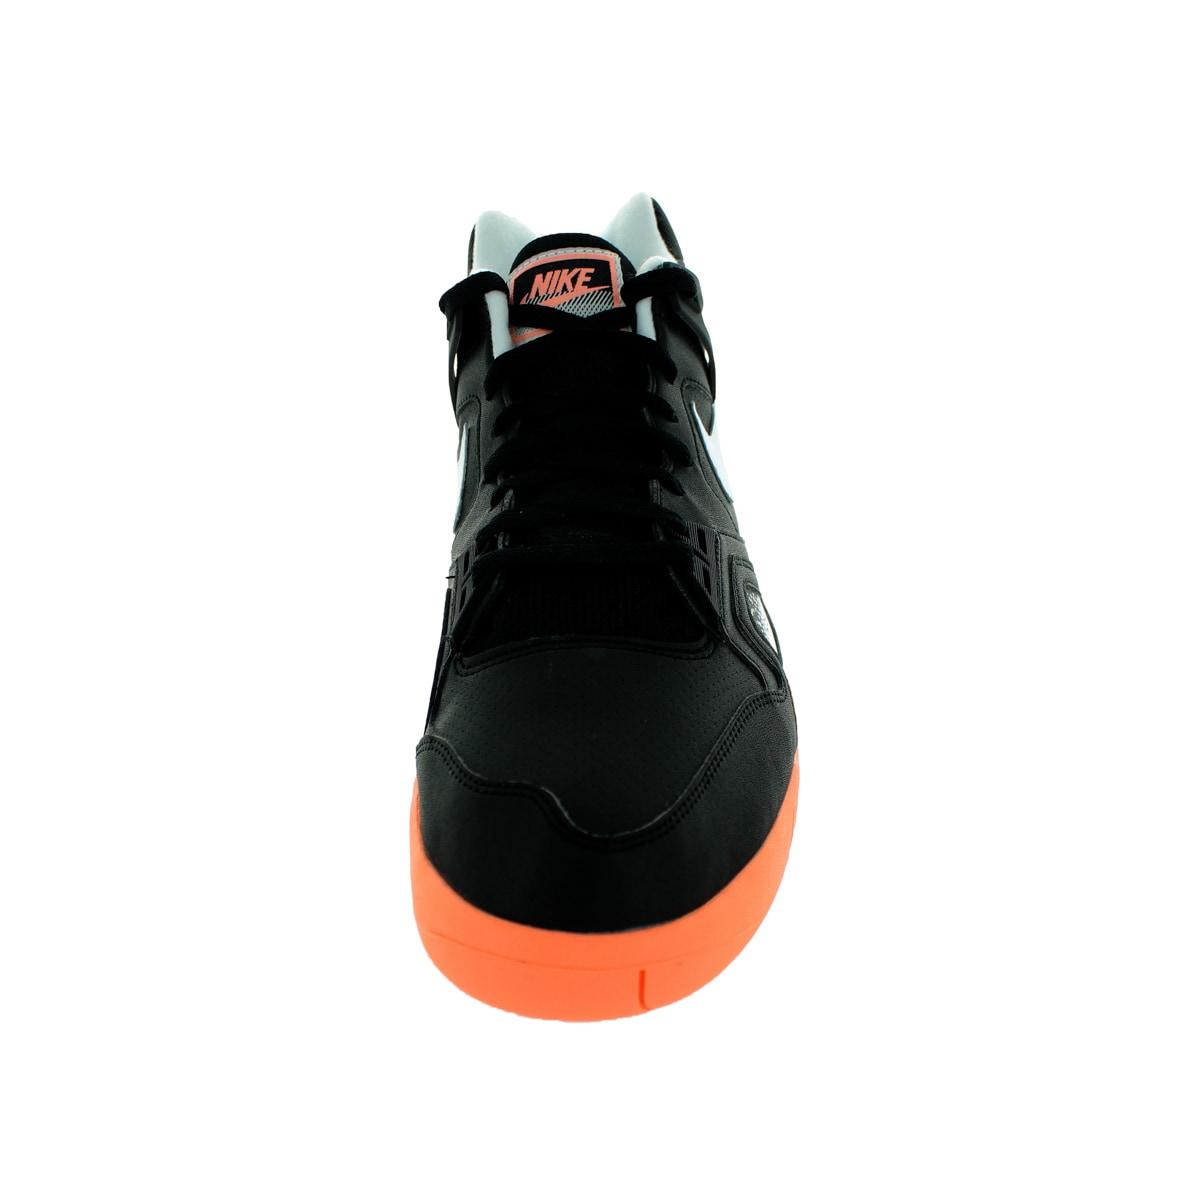 3772547ccf9 Shop Nike Men s Air Tech Challenge Ii Black White Sunset Glow Tennis Shoe -  Free Shipping Today - Overstock - 12328681